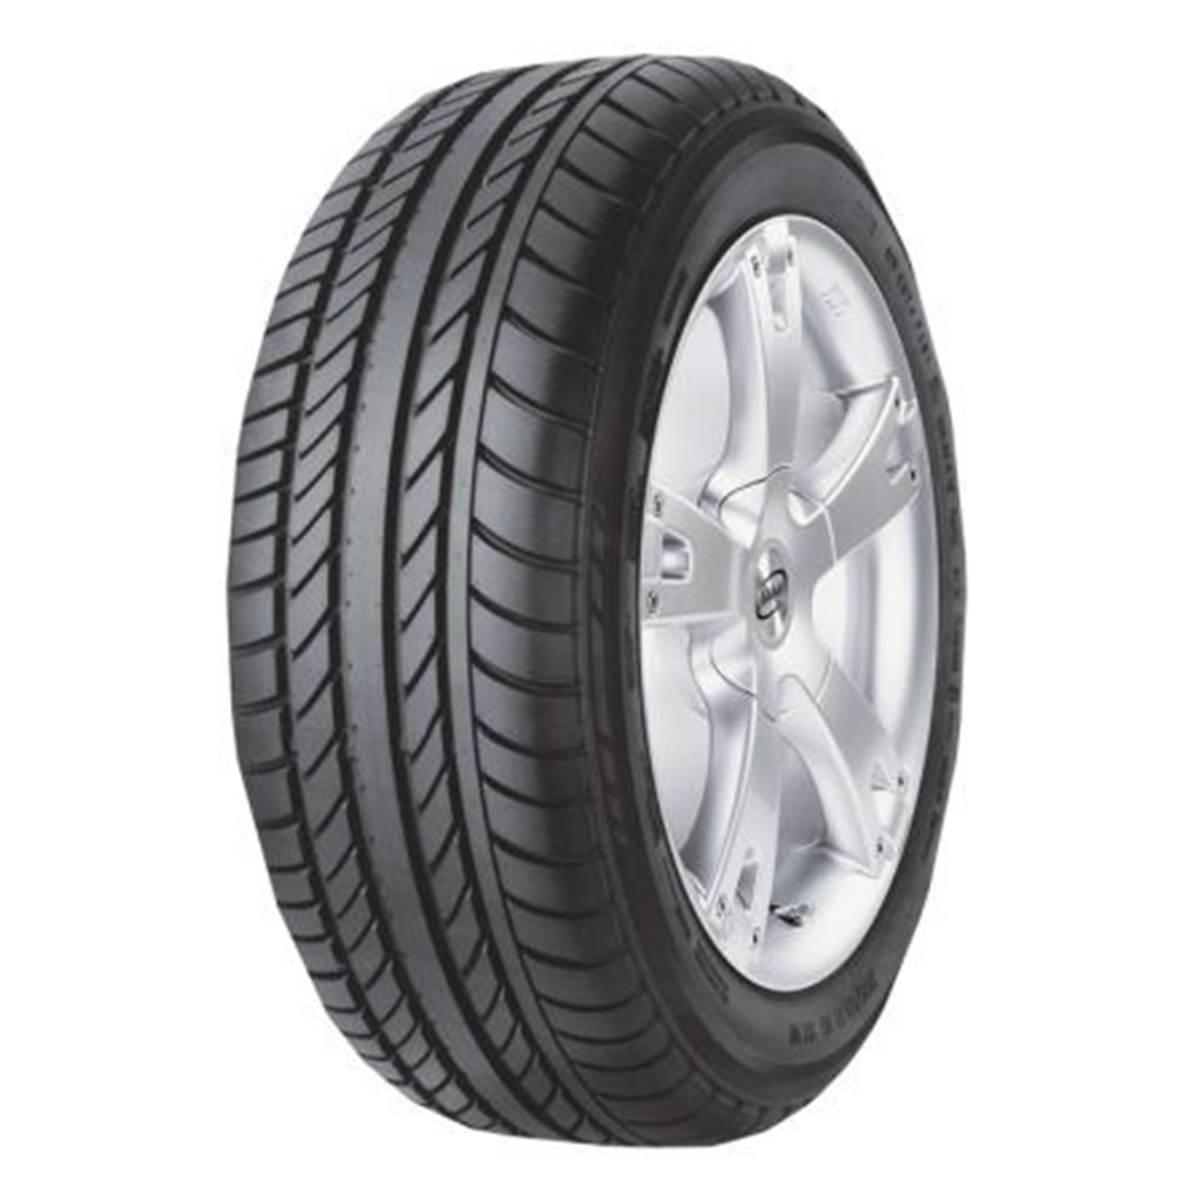 pneu continental conti sportcontact moins cher sur pneu pas cher. Black Bedroom Furniture Sets. Home Design Ideas